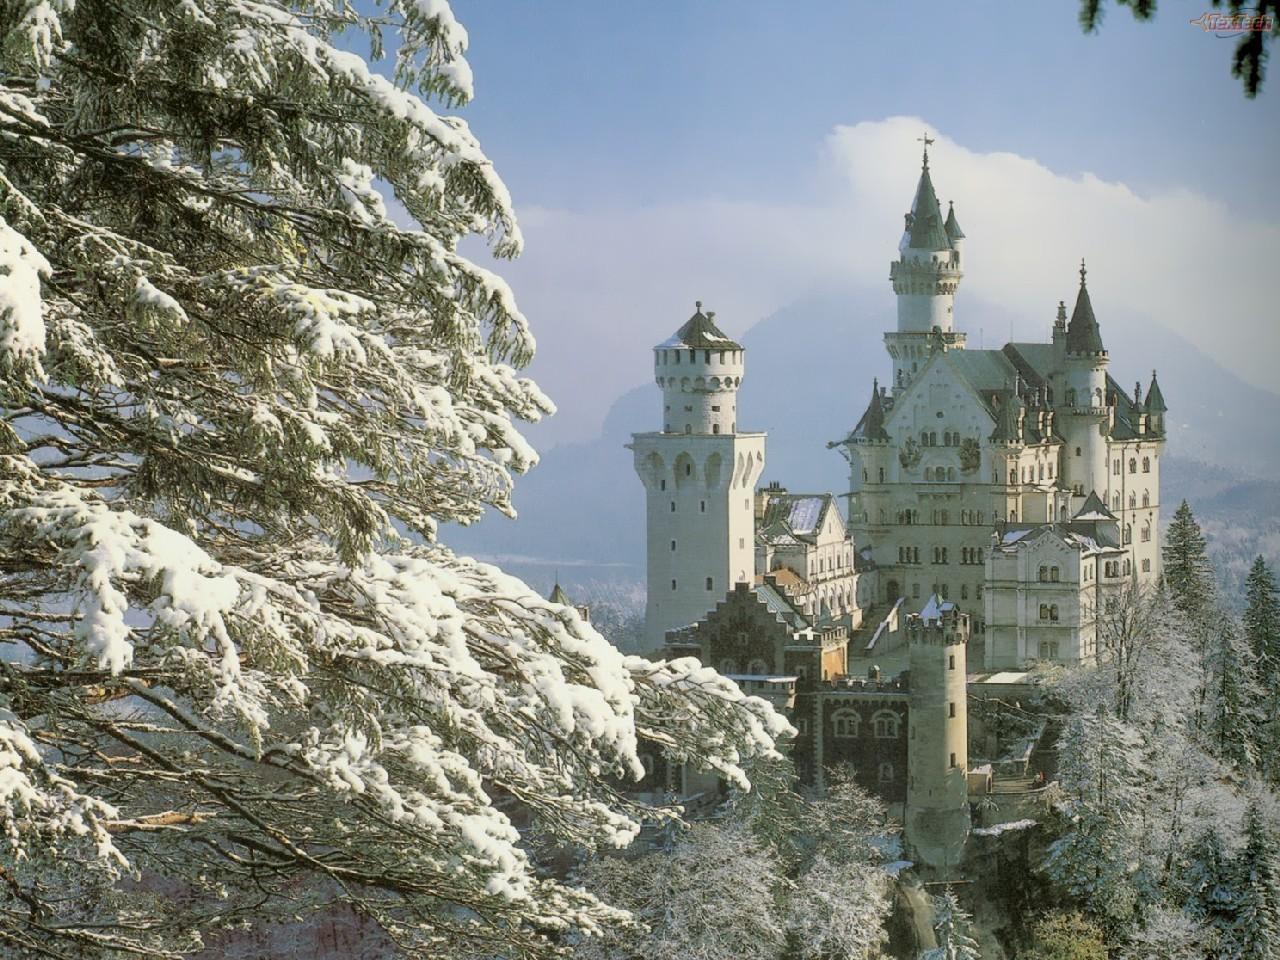 neuschwanstein castle germany in the snow 2 lancastria 1280x960